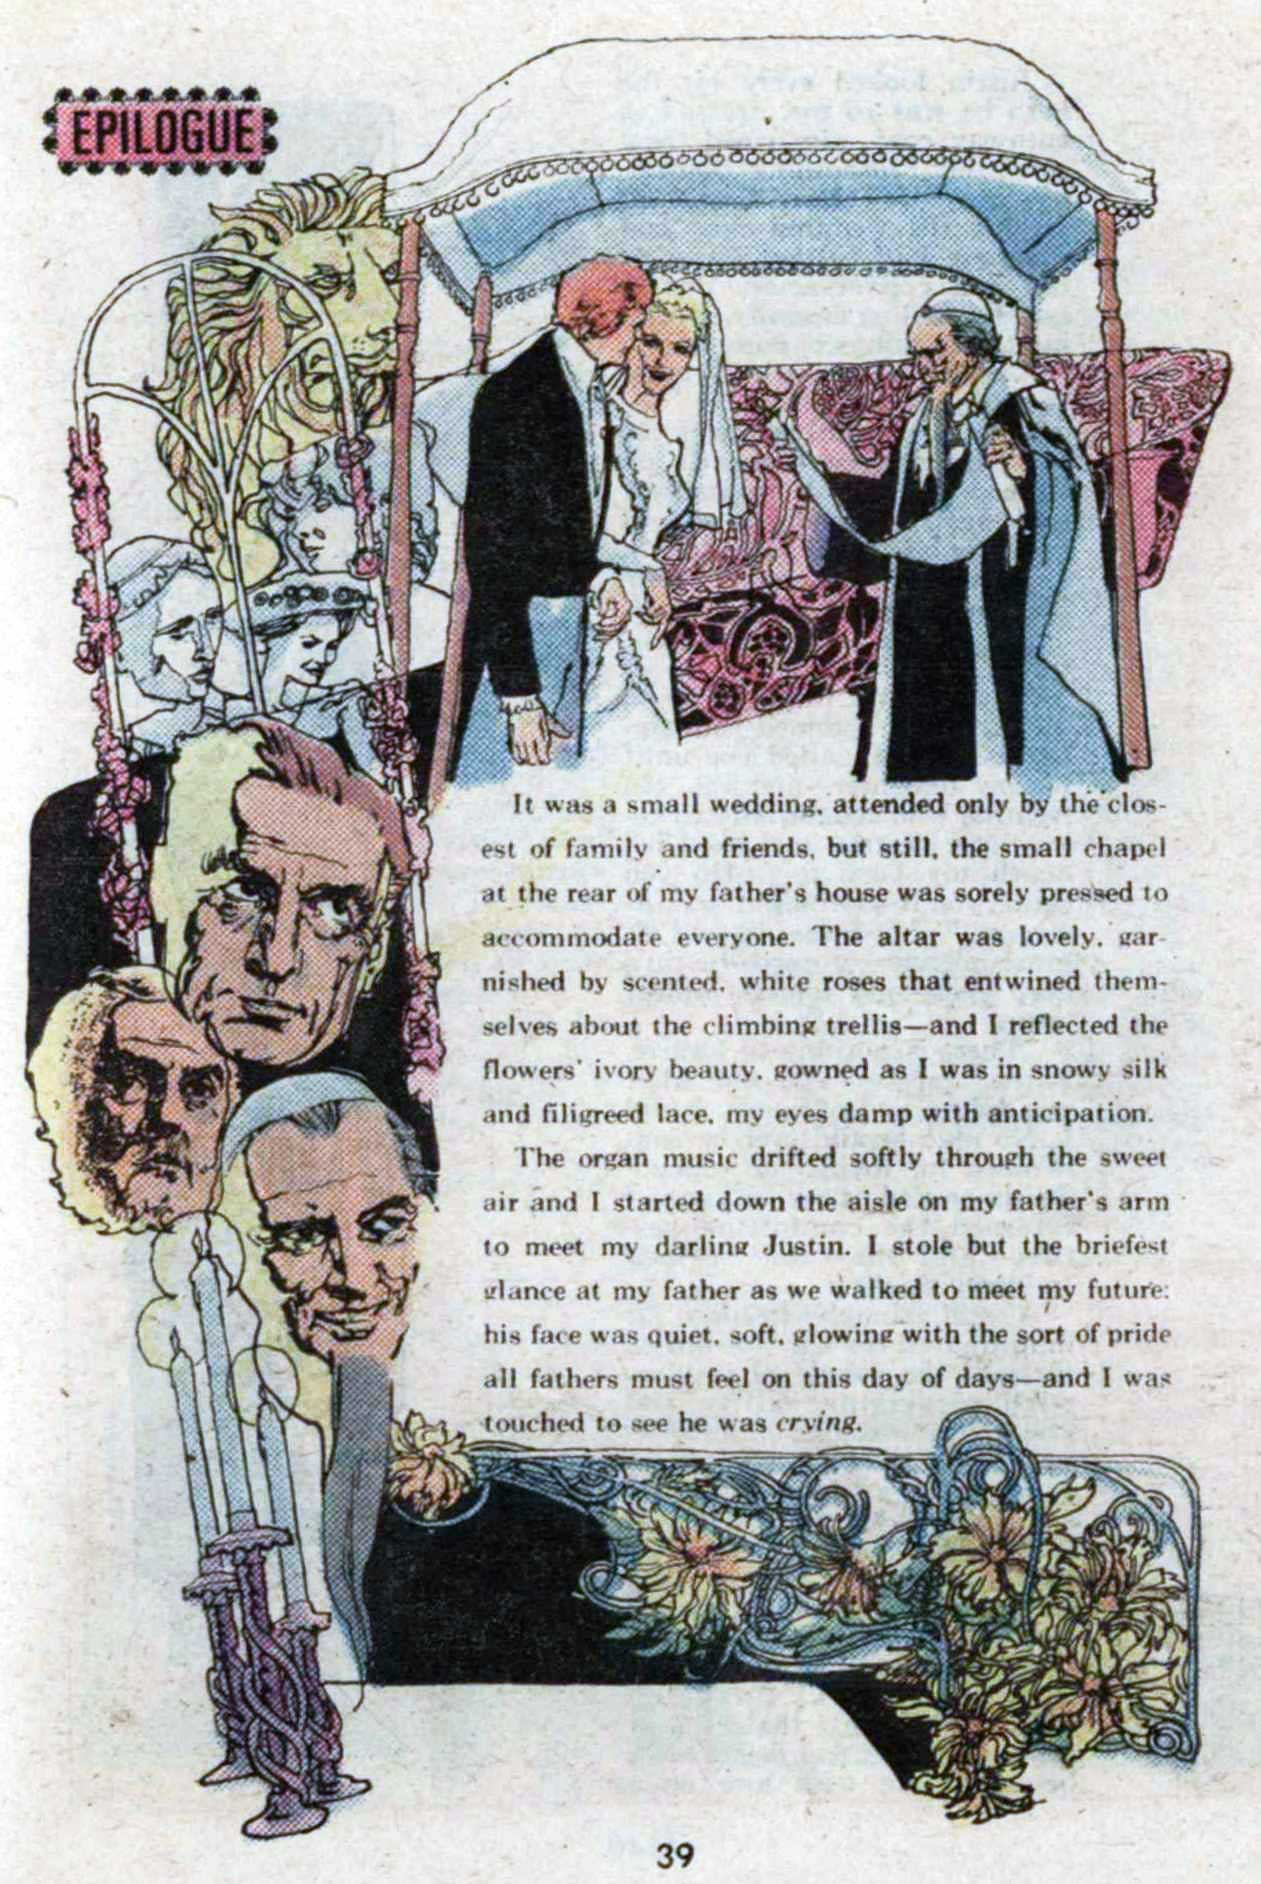 DC Special Blue Ribbon Digest #20: Dark Mansions of Forbidden Love